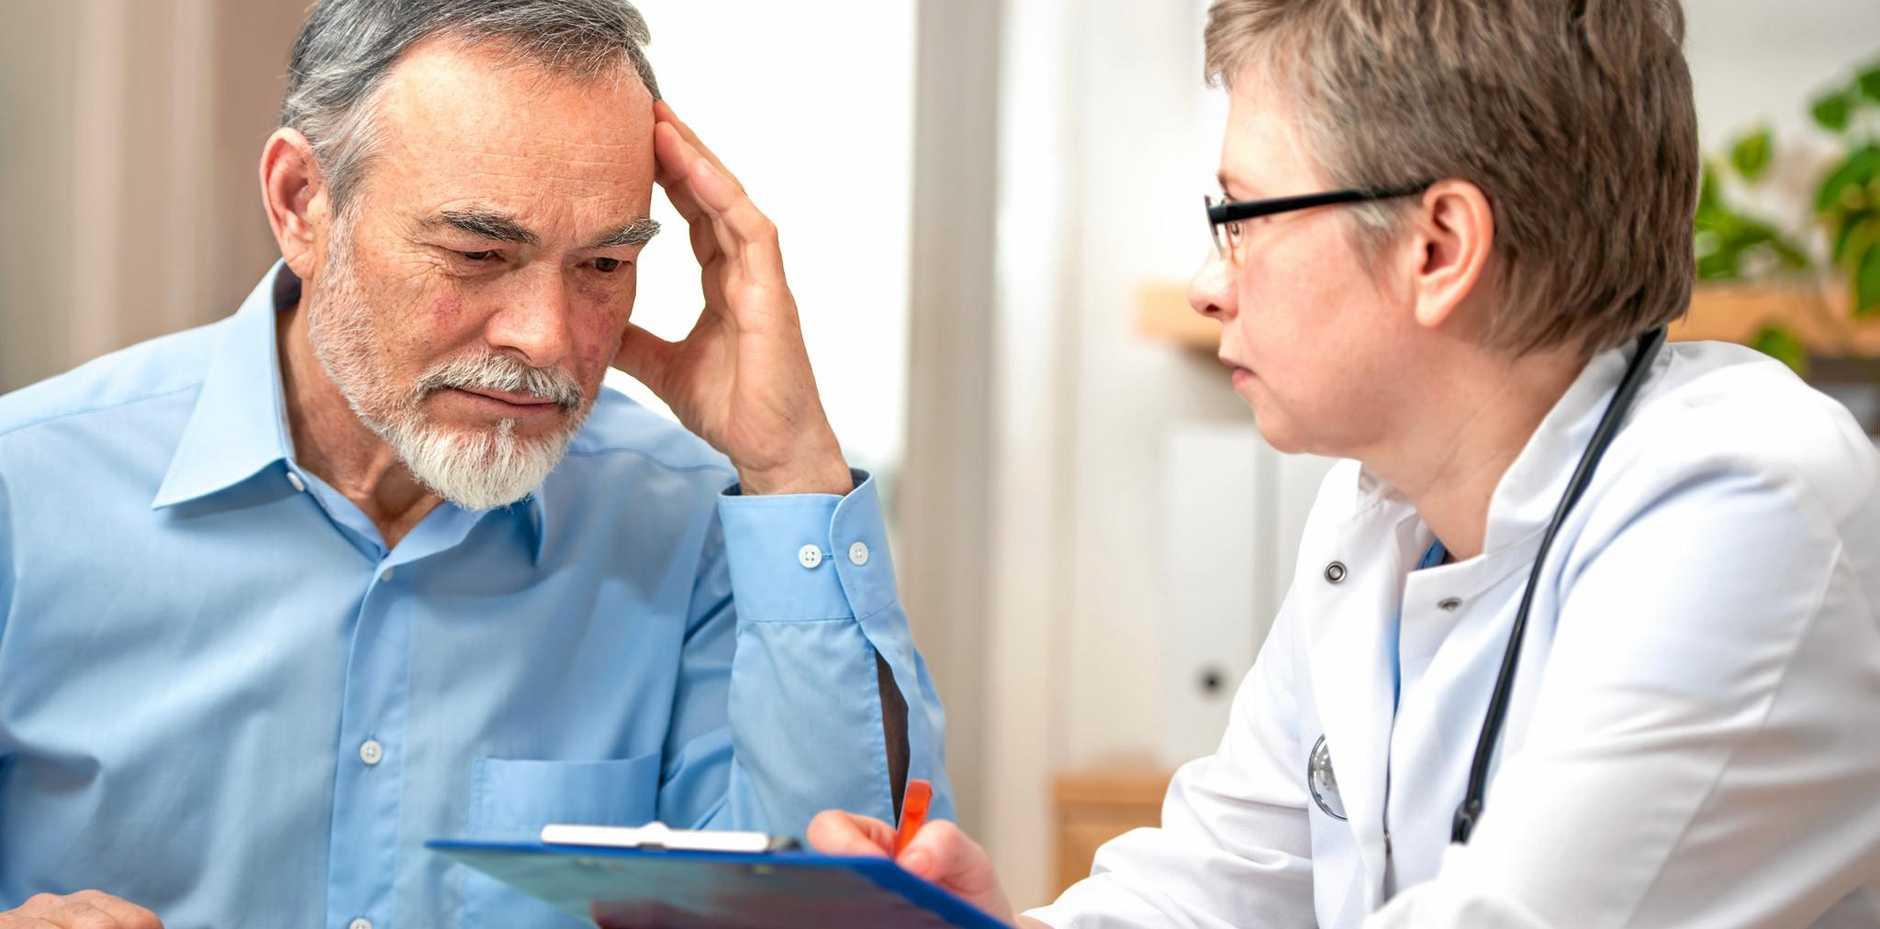 Chronic pain is a major health issue for Australians.